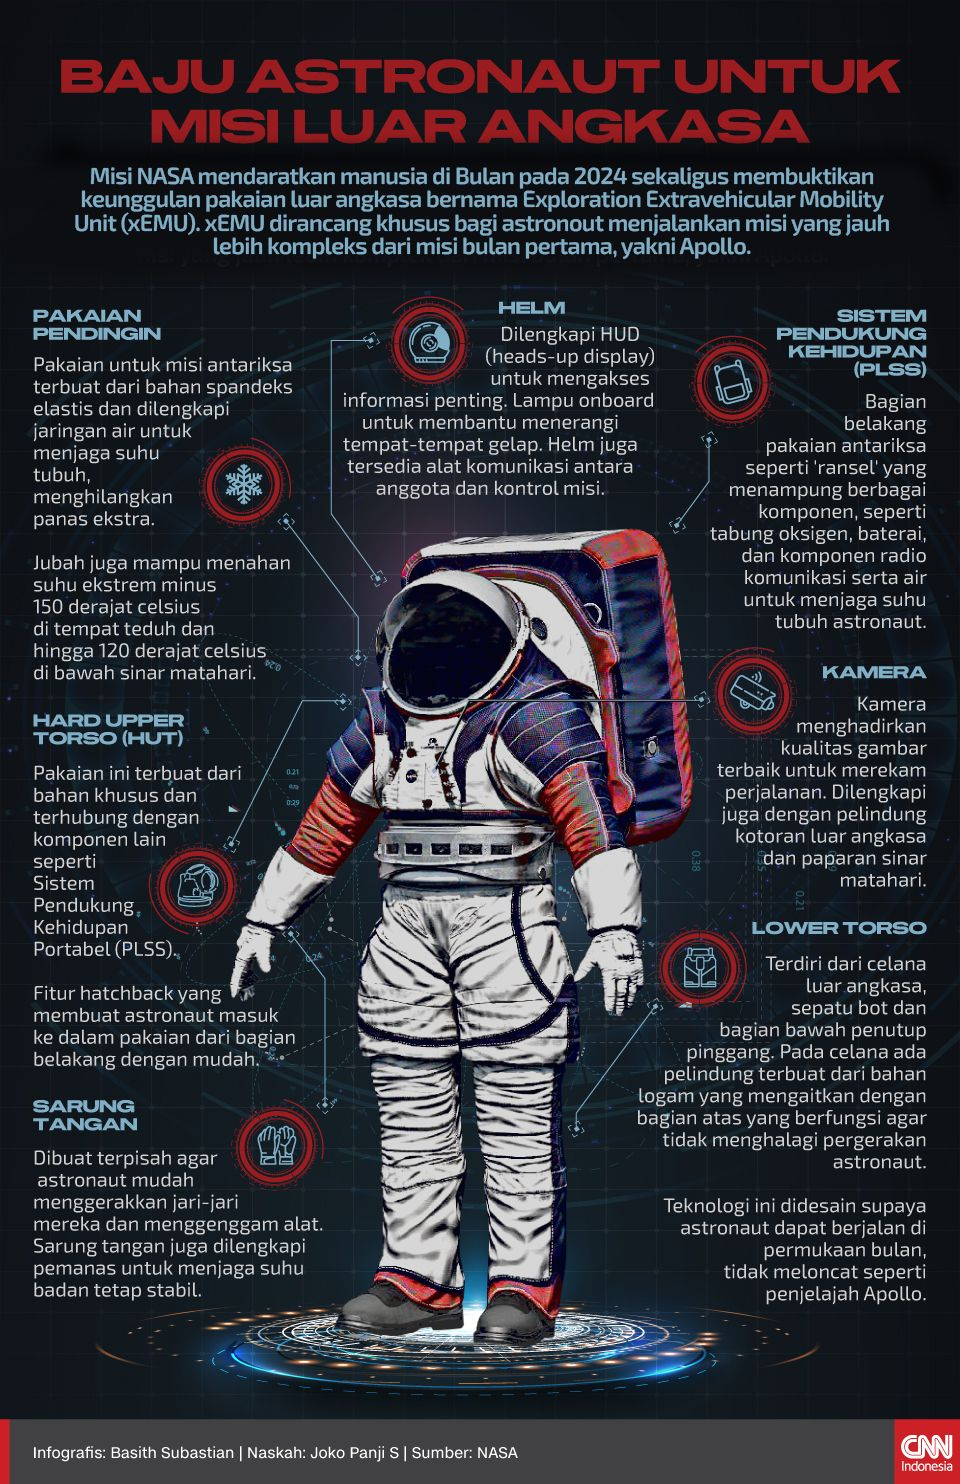 Infografis Baju Astronaut untuk Misi Luar Angkasa